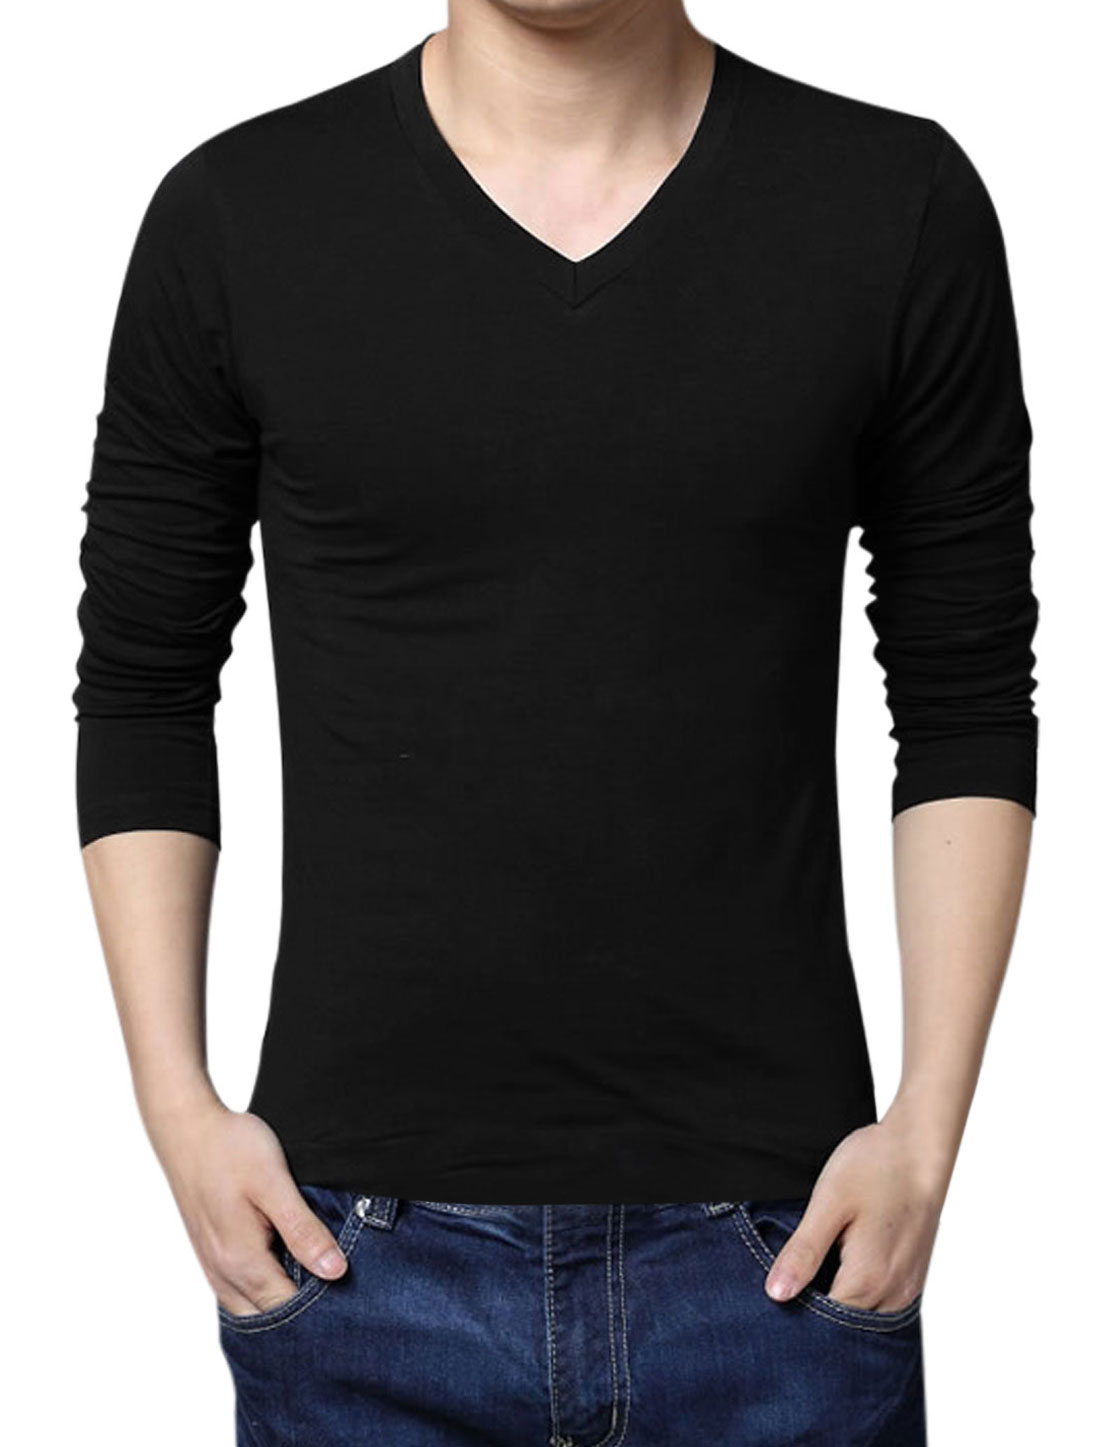 Men V Neck Long Sleeve Slim Fit Soft Tee Black XL